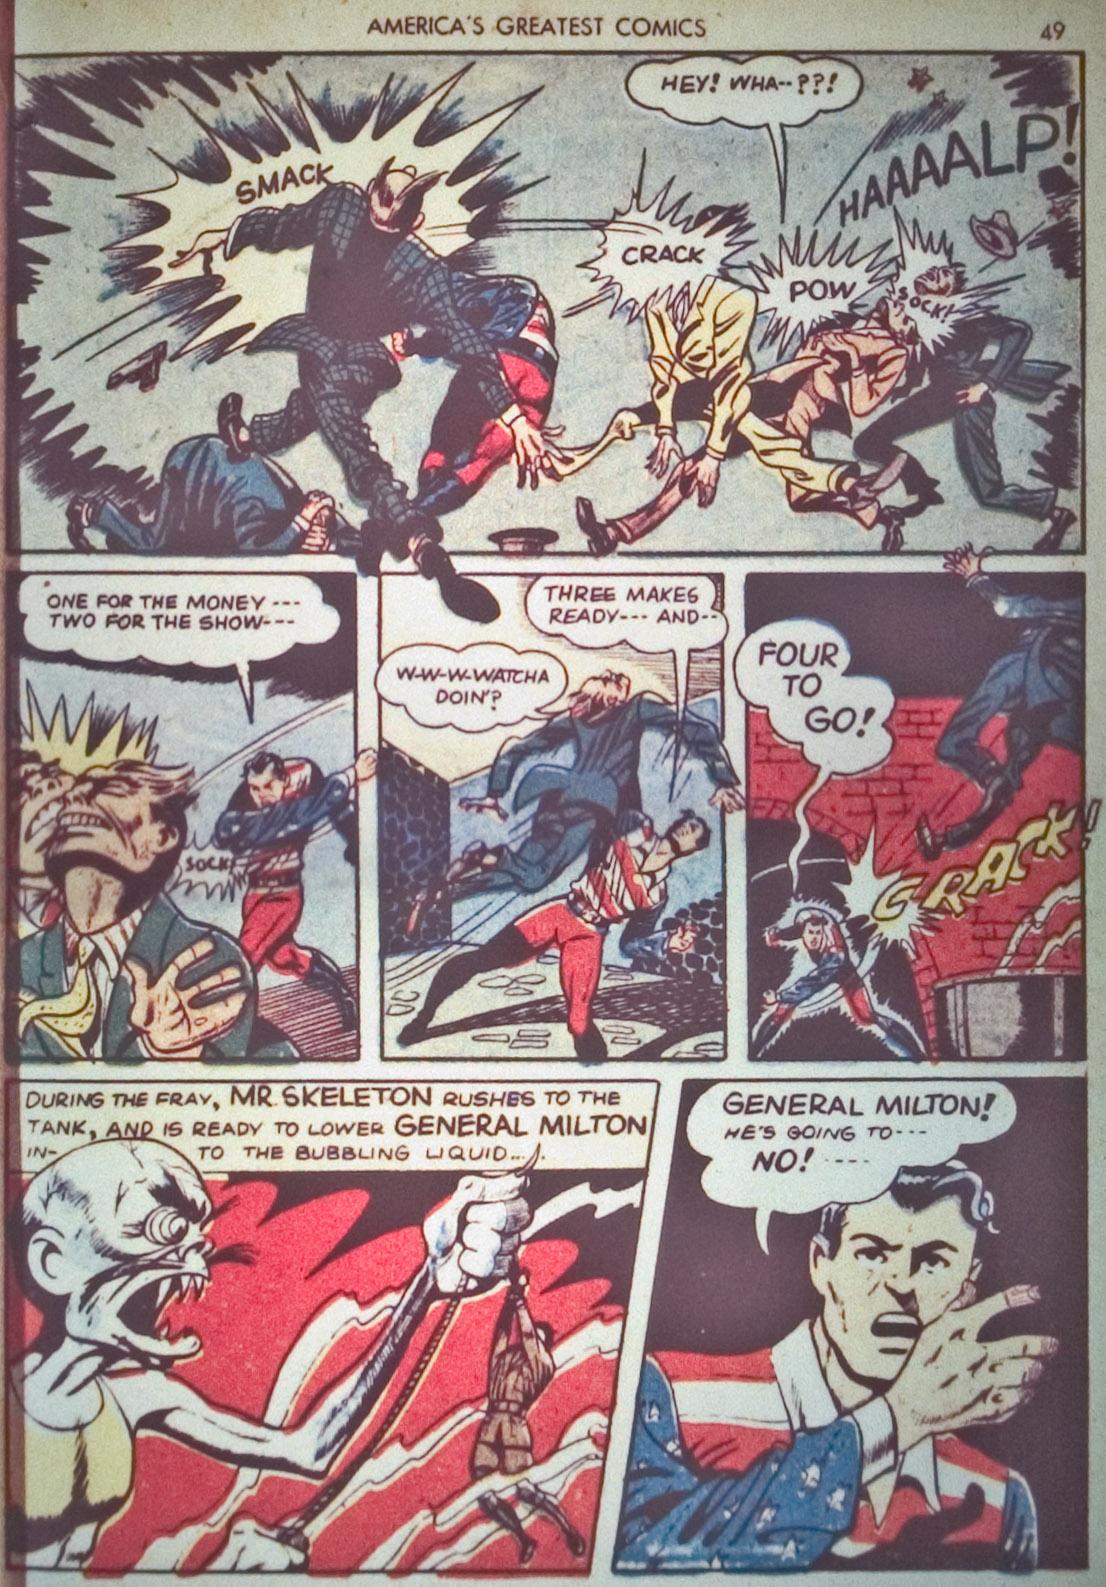 Read online America's Greatest Comics comic -  Issue #1 - 52